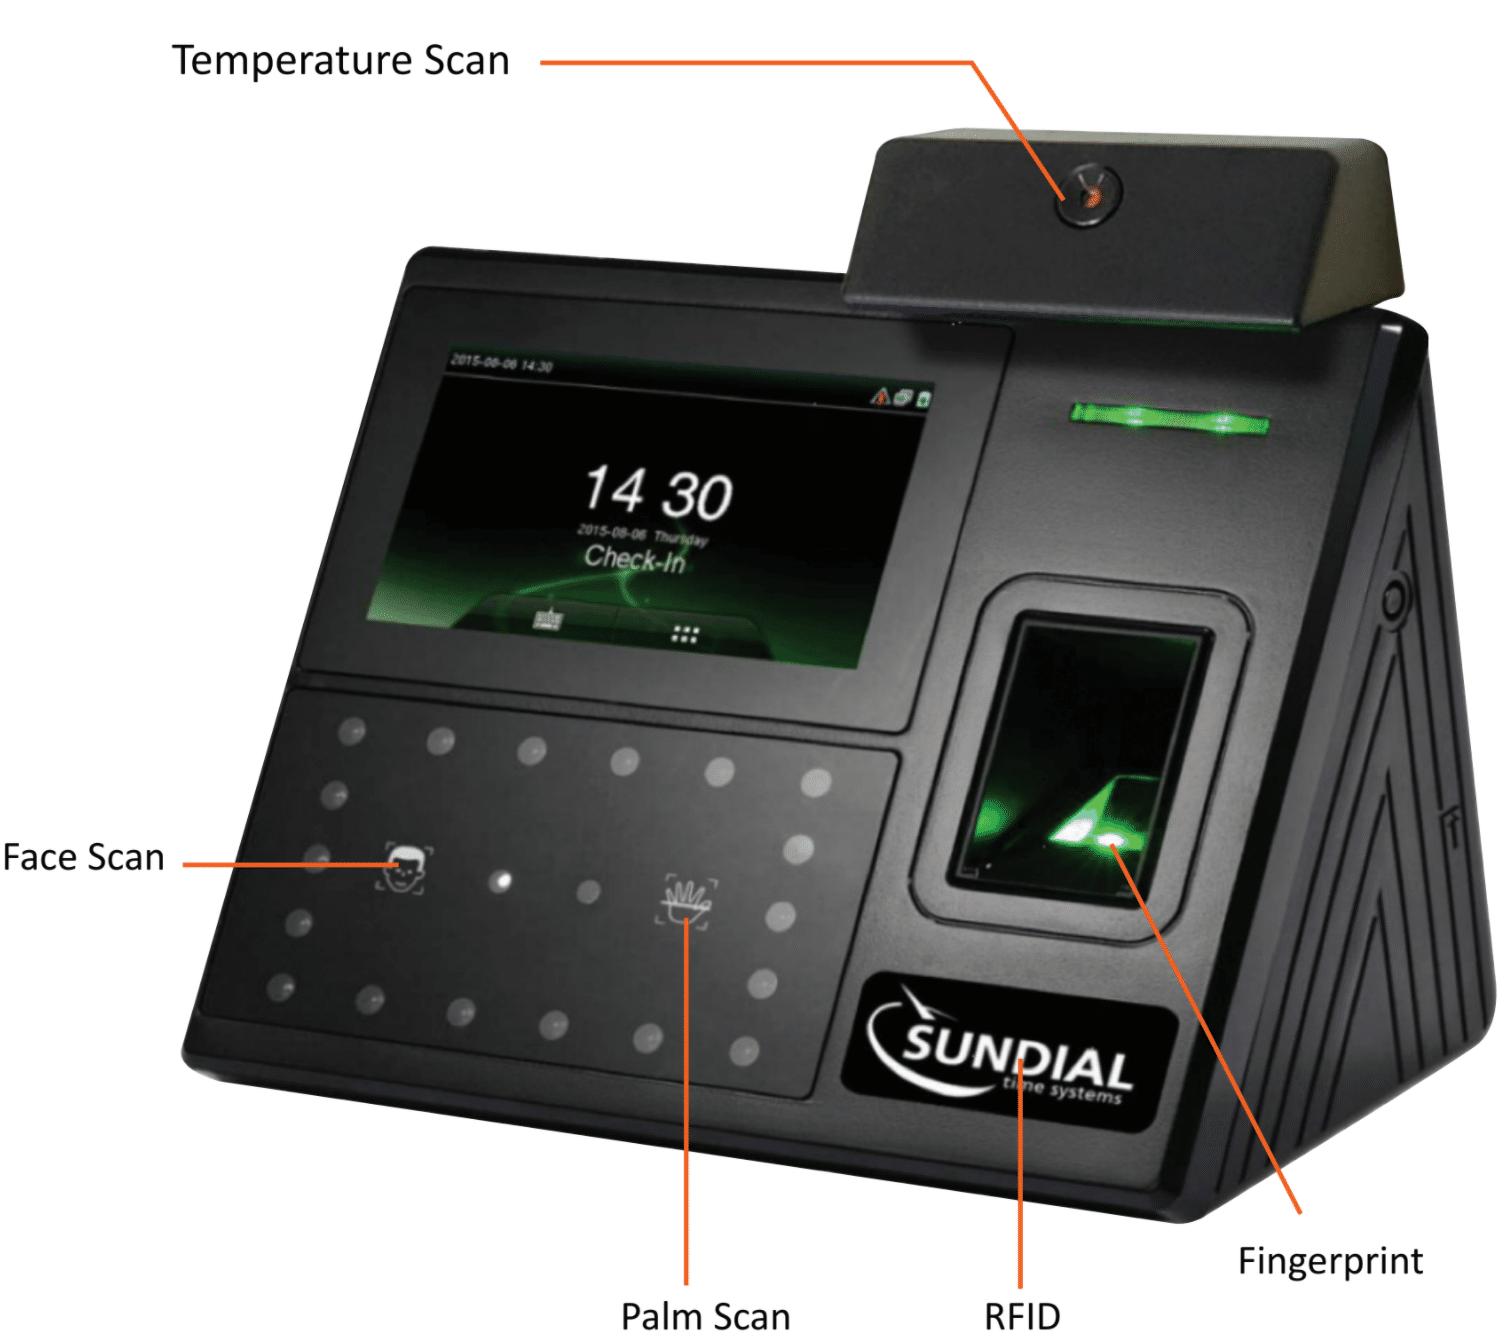 Series 400 Temperature Scan time clock